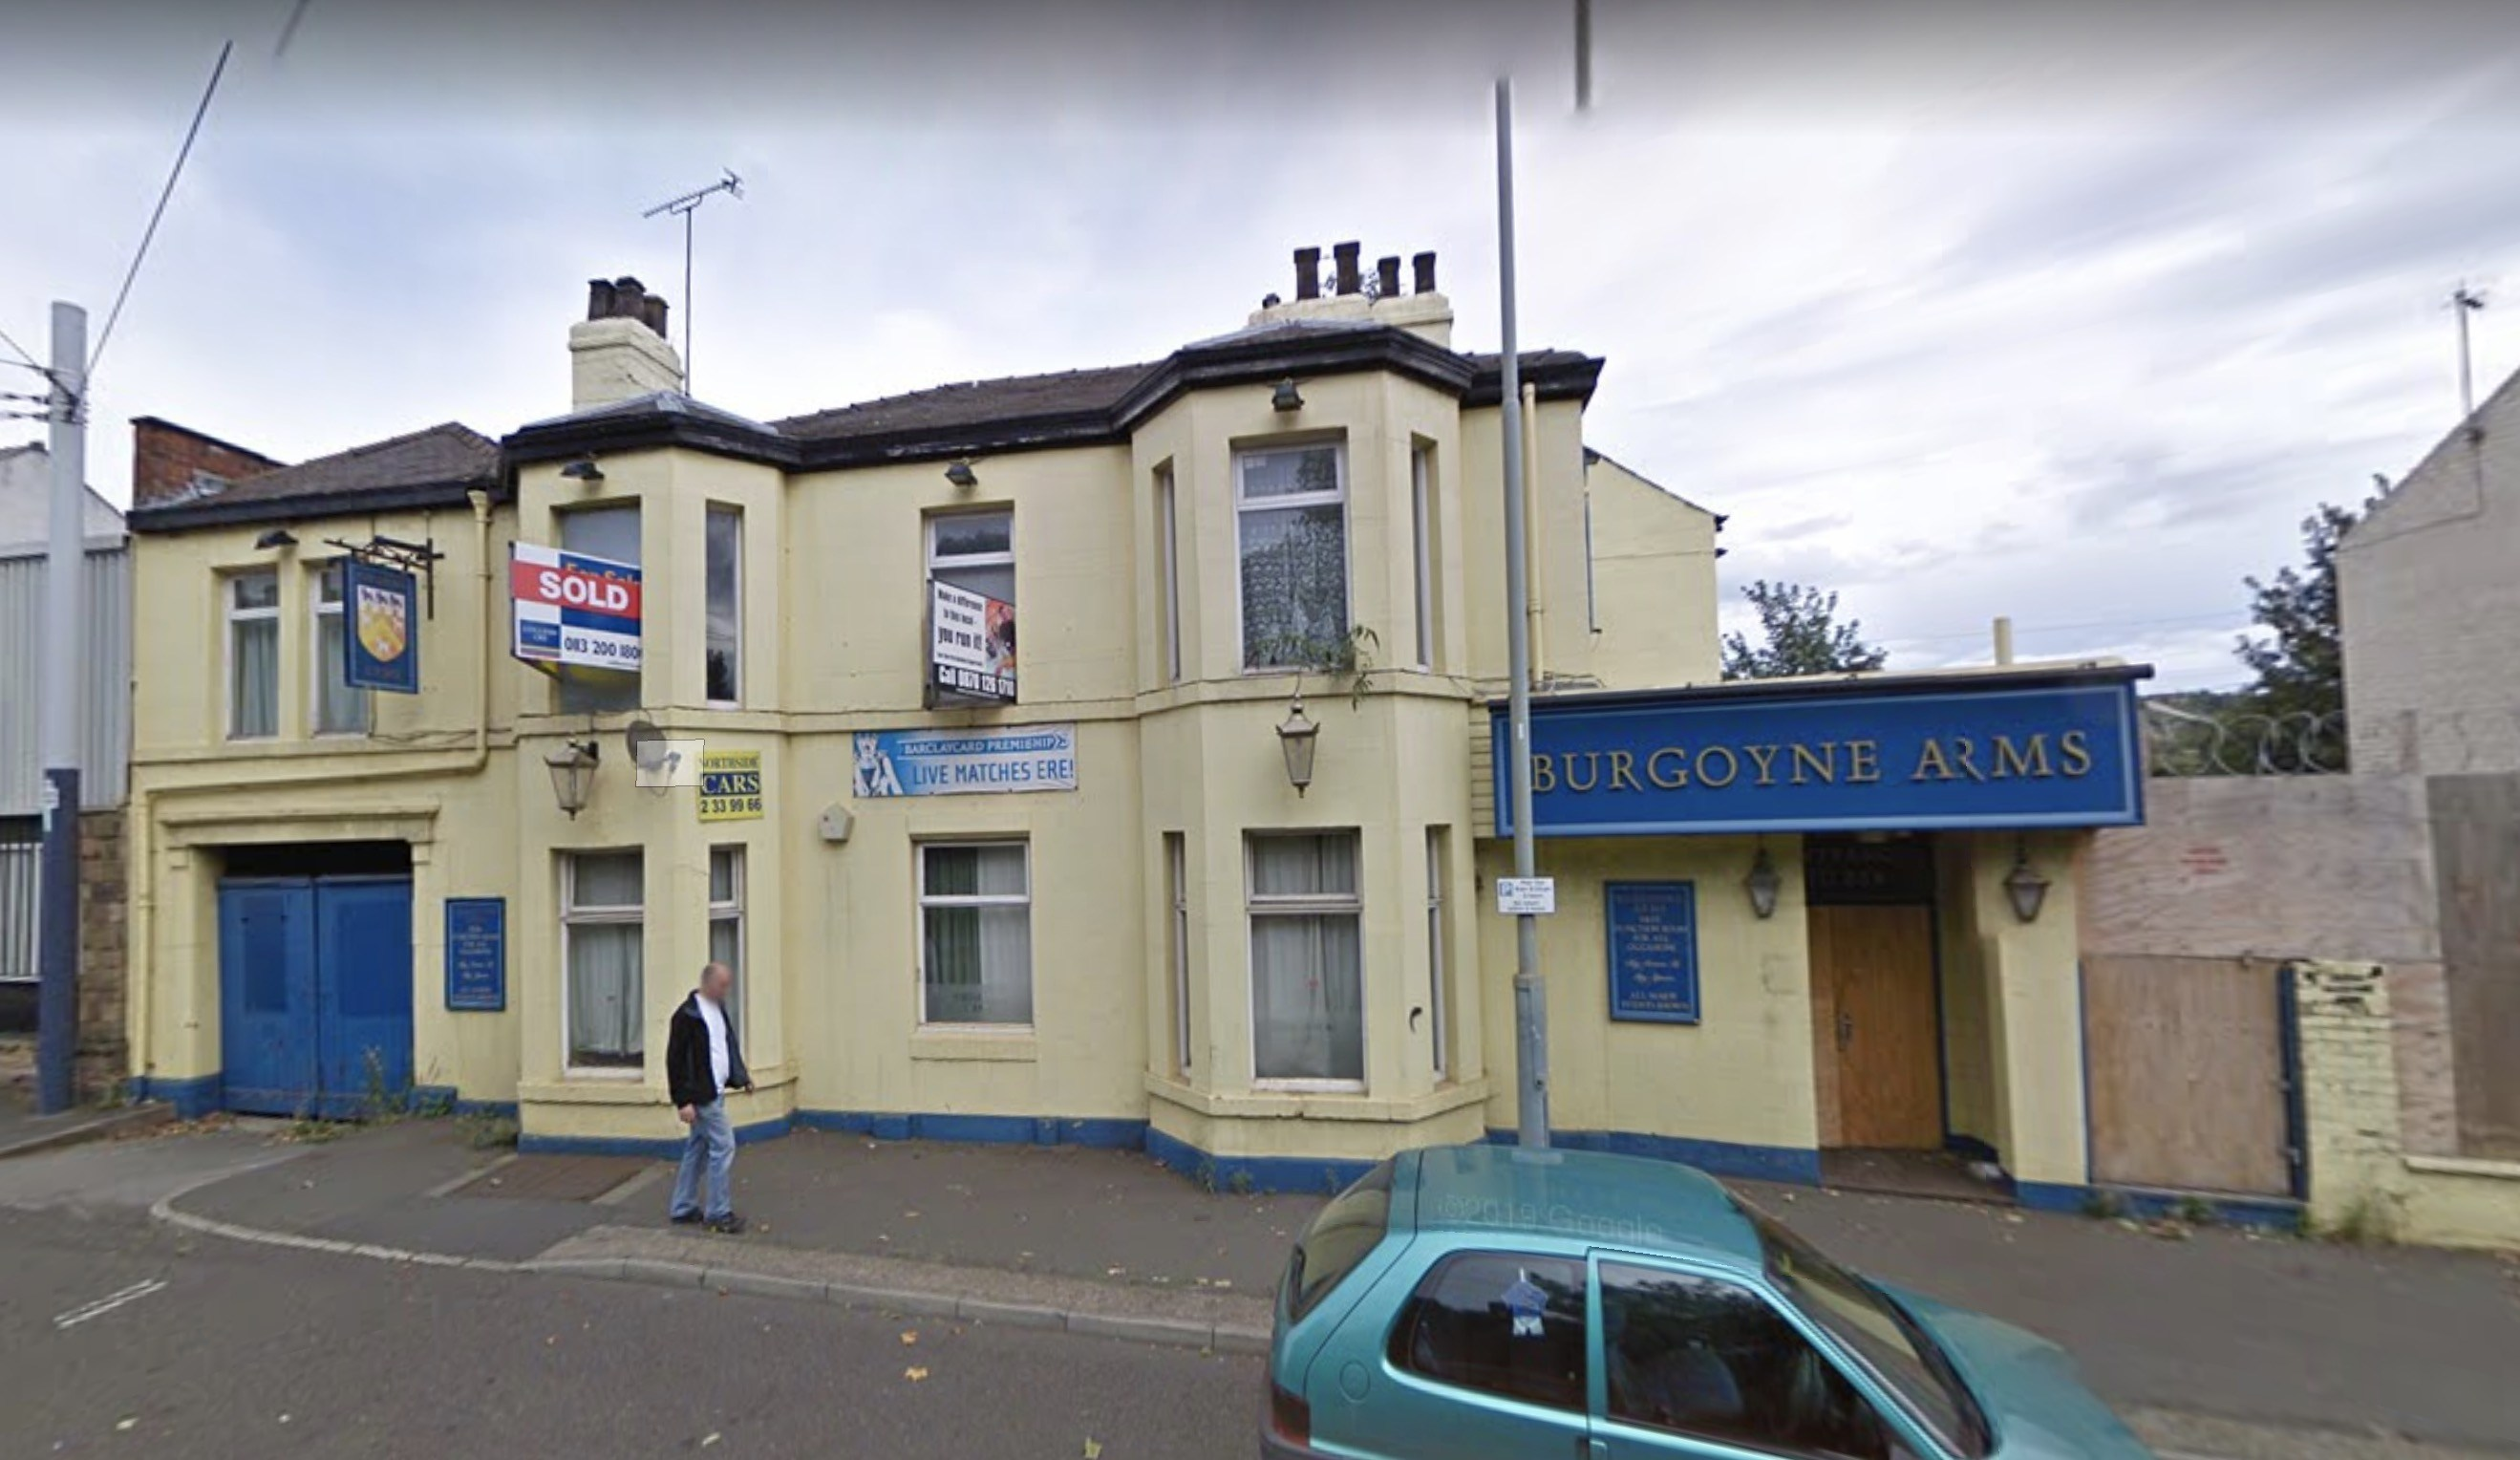 The Burgoyne Arms pub on Langsett Road